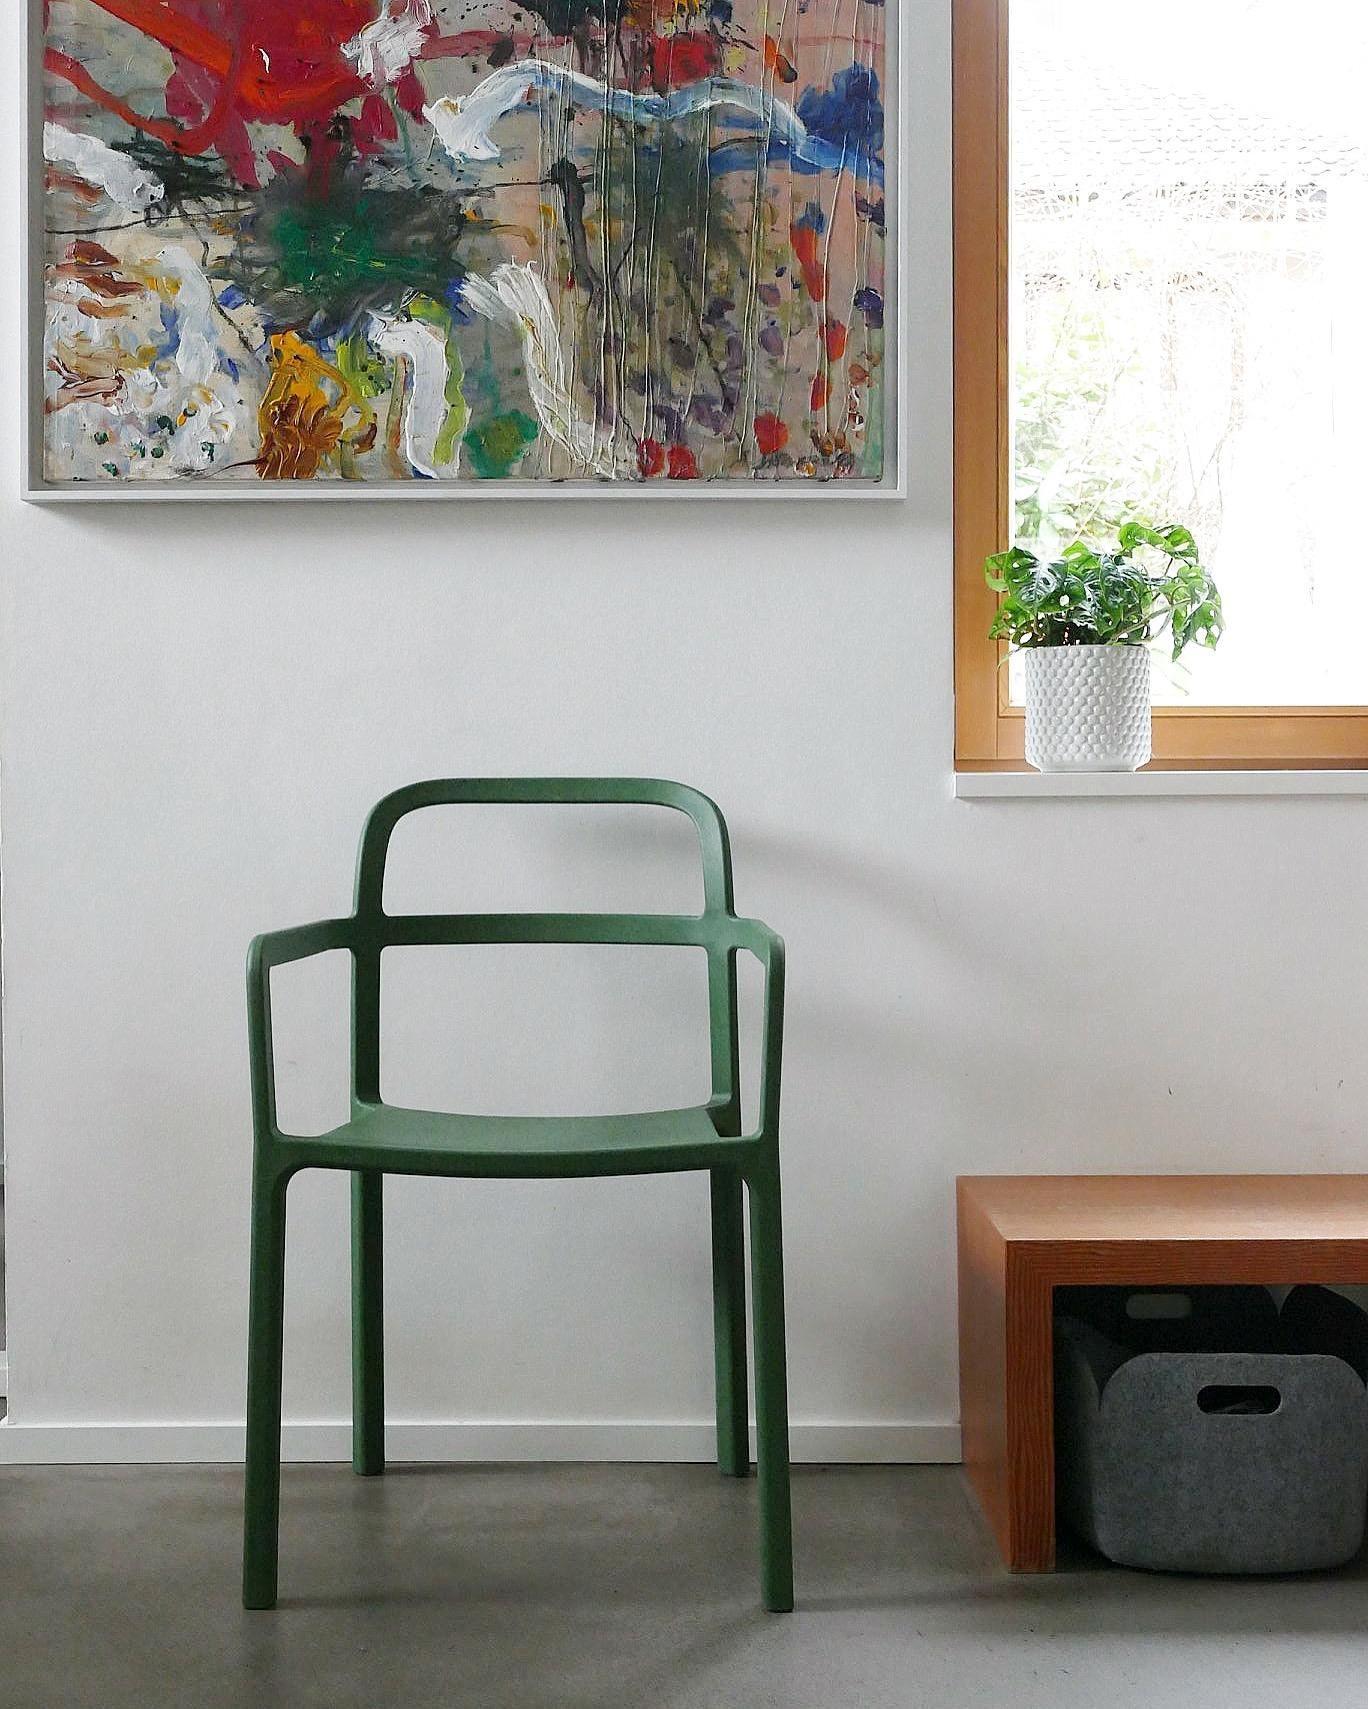 viva mexico chair bilder ideen couchstyle. Black Bedroom Furniture Sets. Home Design Ideas